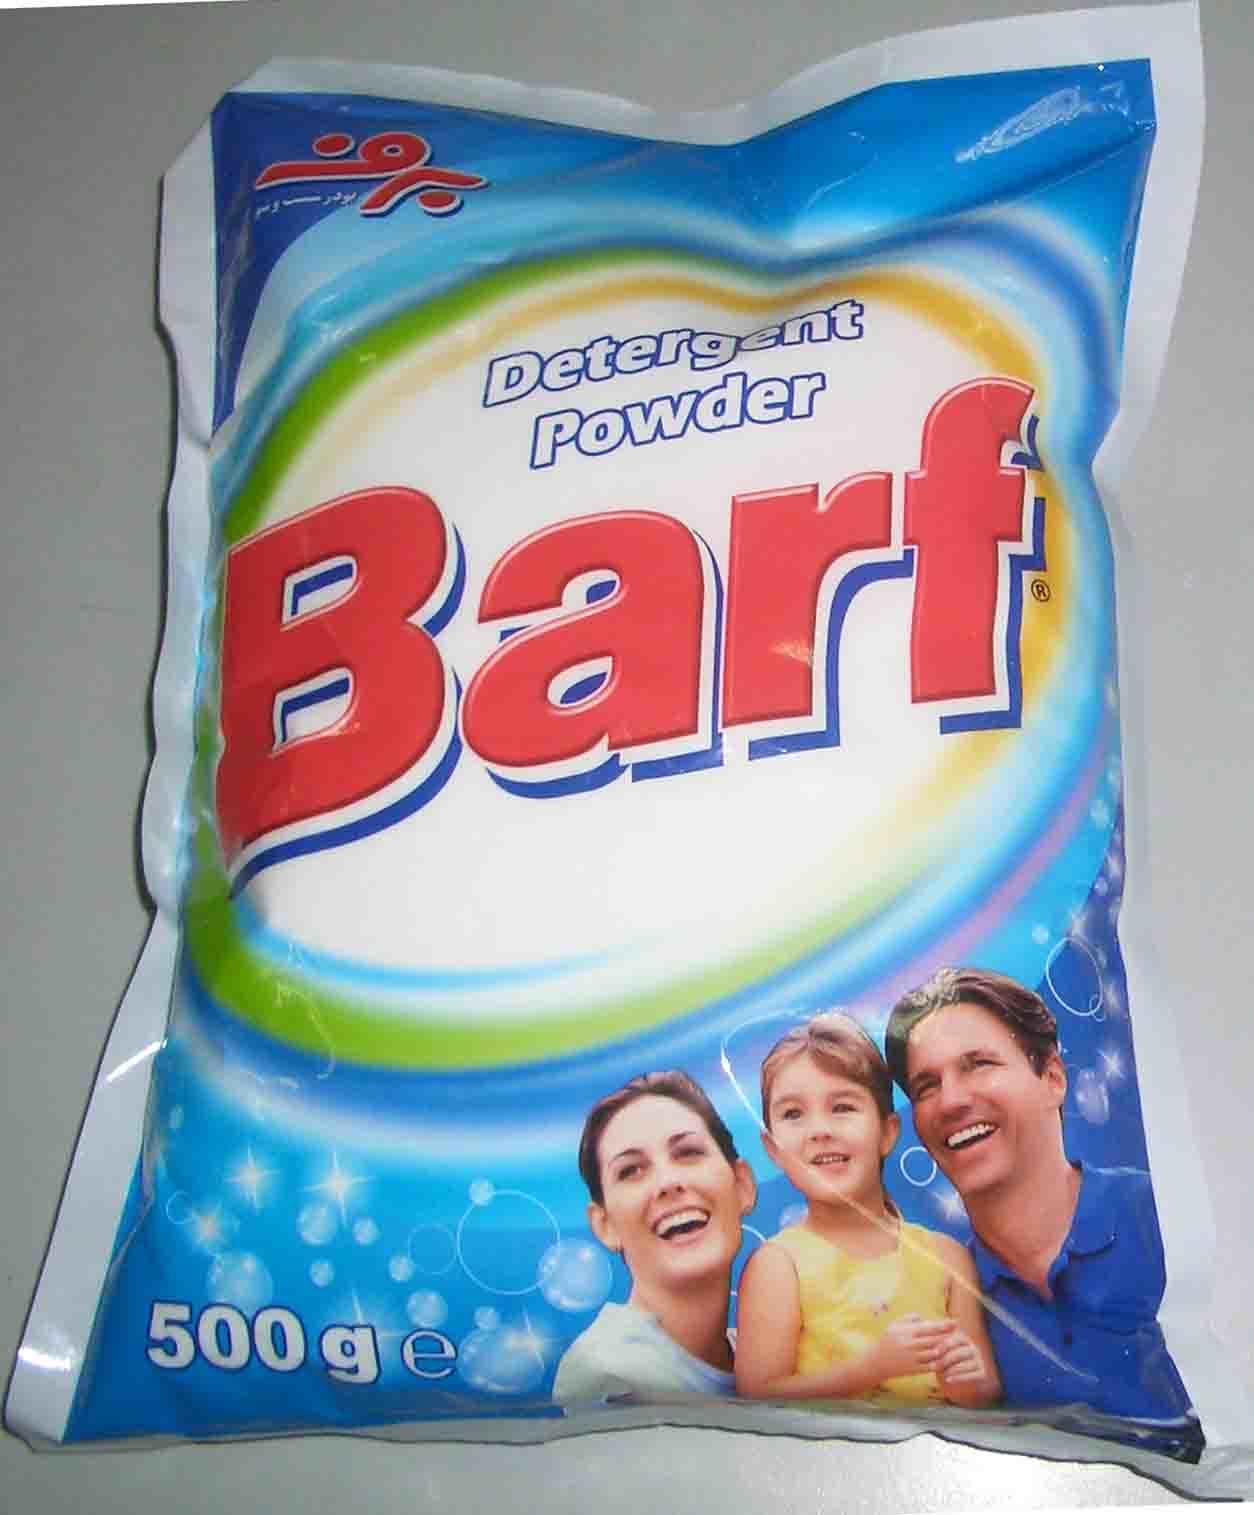 15-25kg Bulk Powder Detergent, Laundry Powder